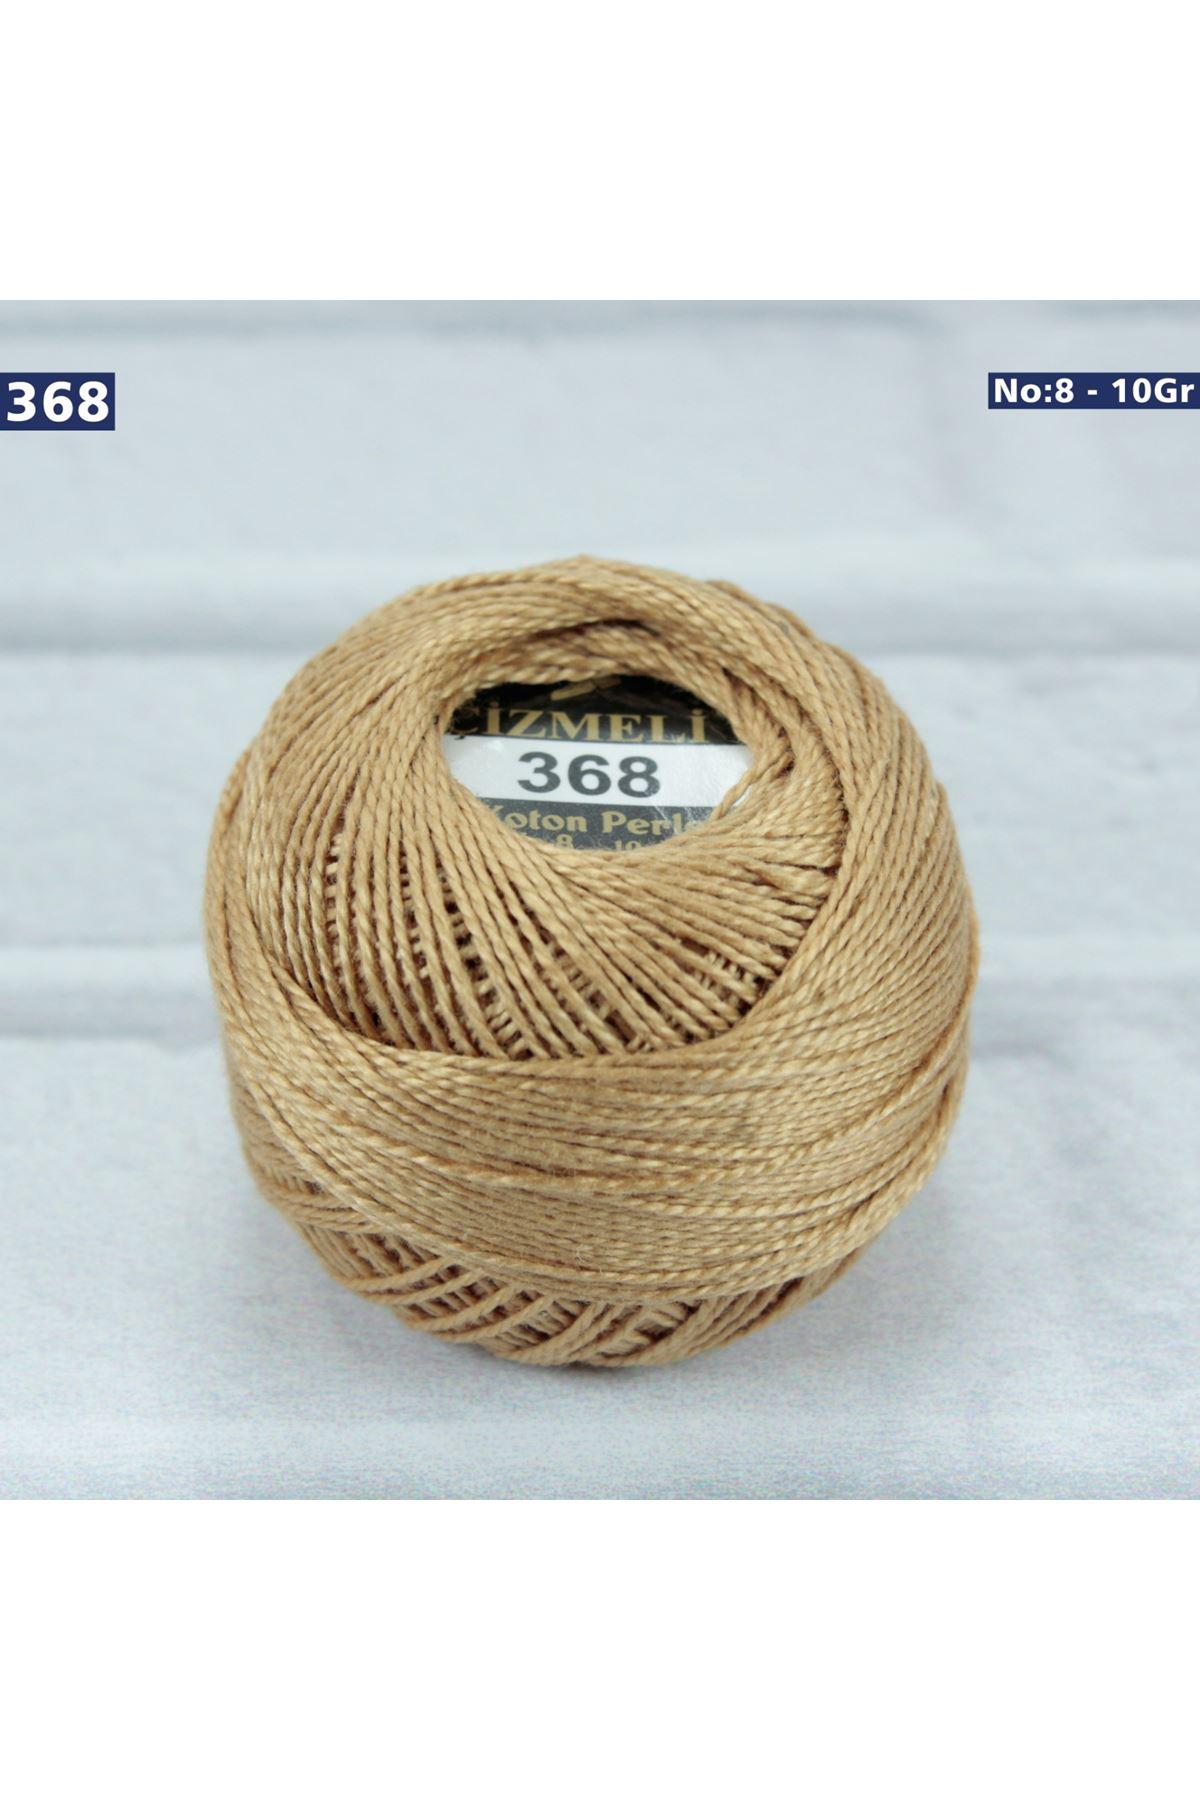 Çizmeli Cotton Perle Nakış İpliği No: 368